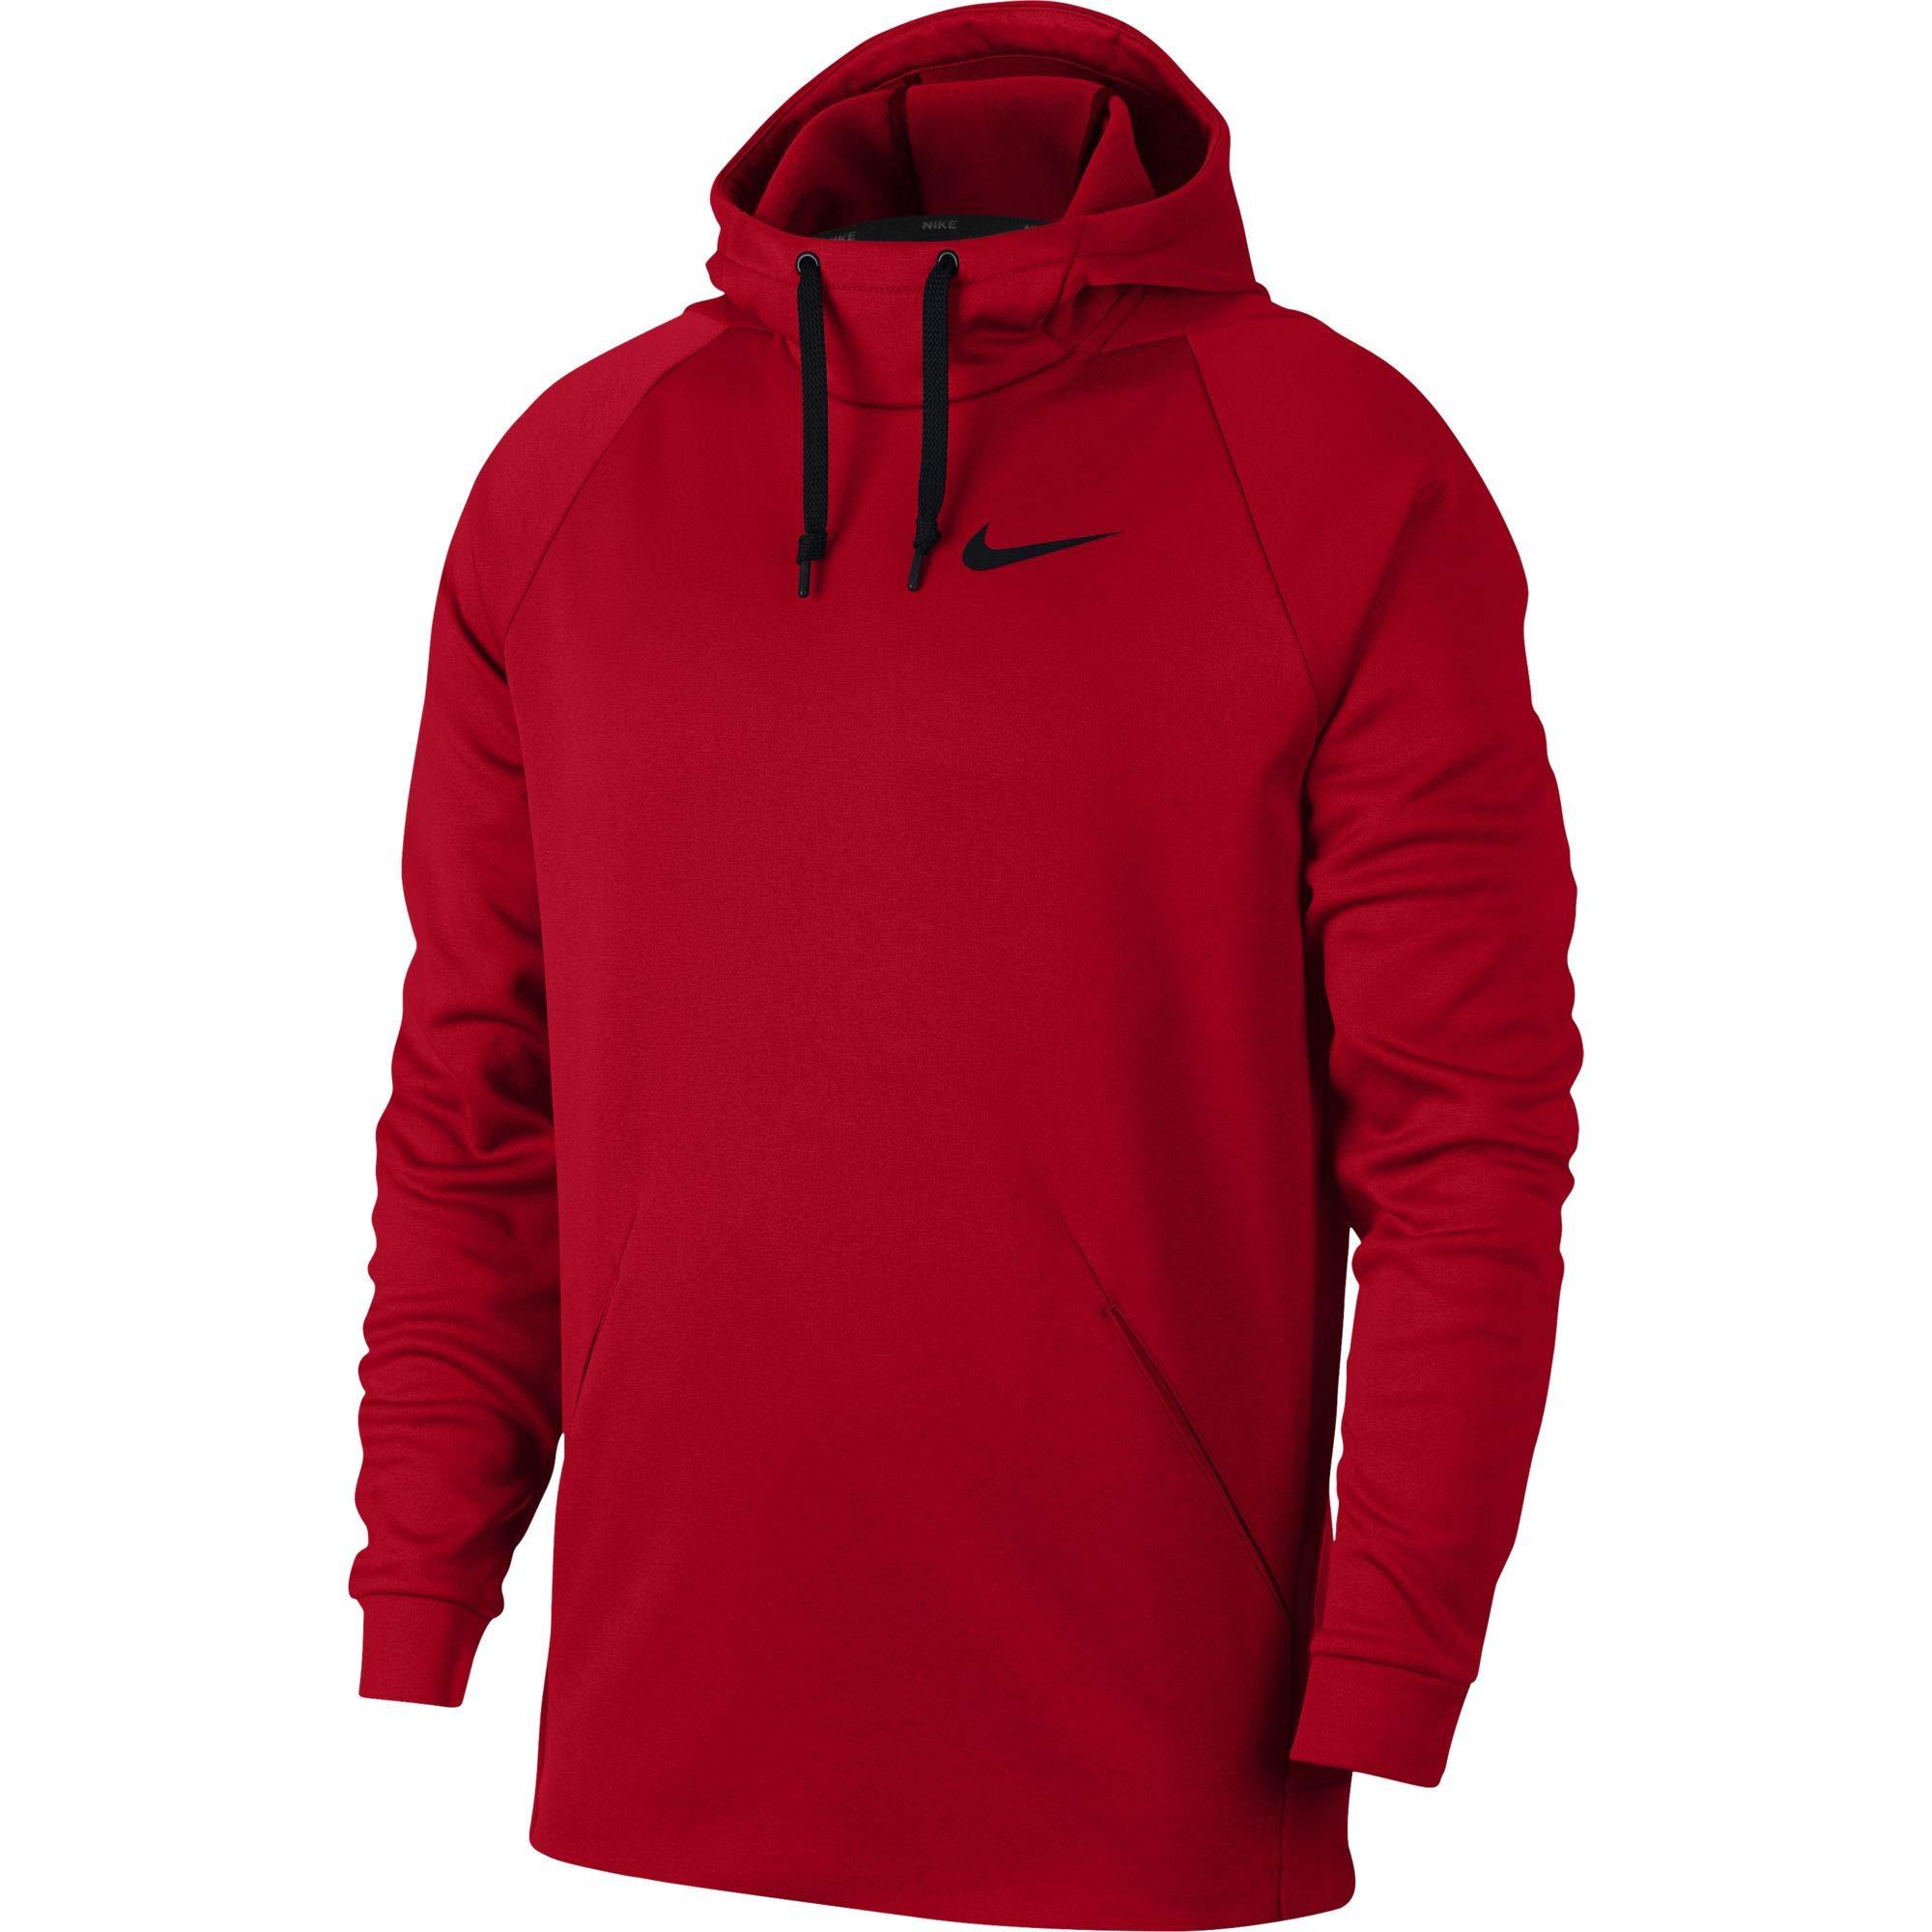 Nike Men's Therma Training Hoodie University Red/Black, Size Large